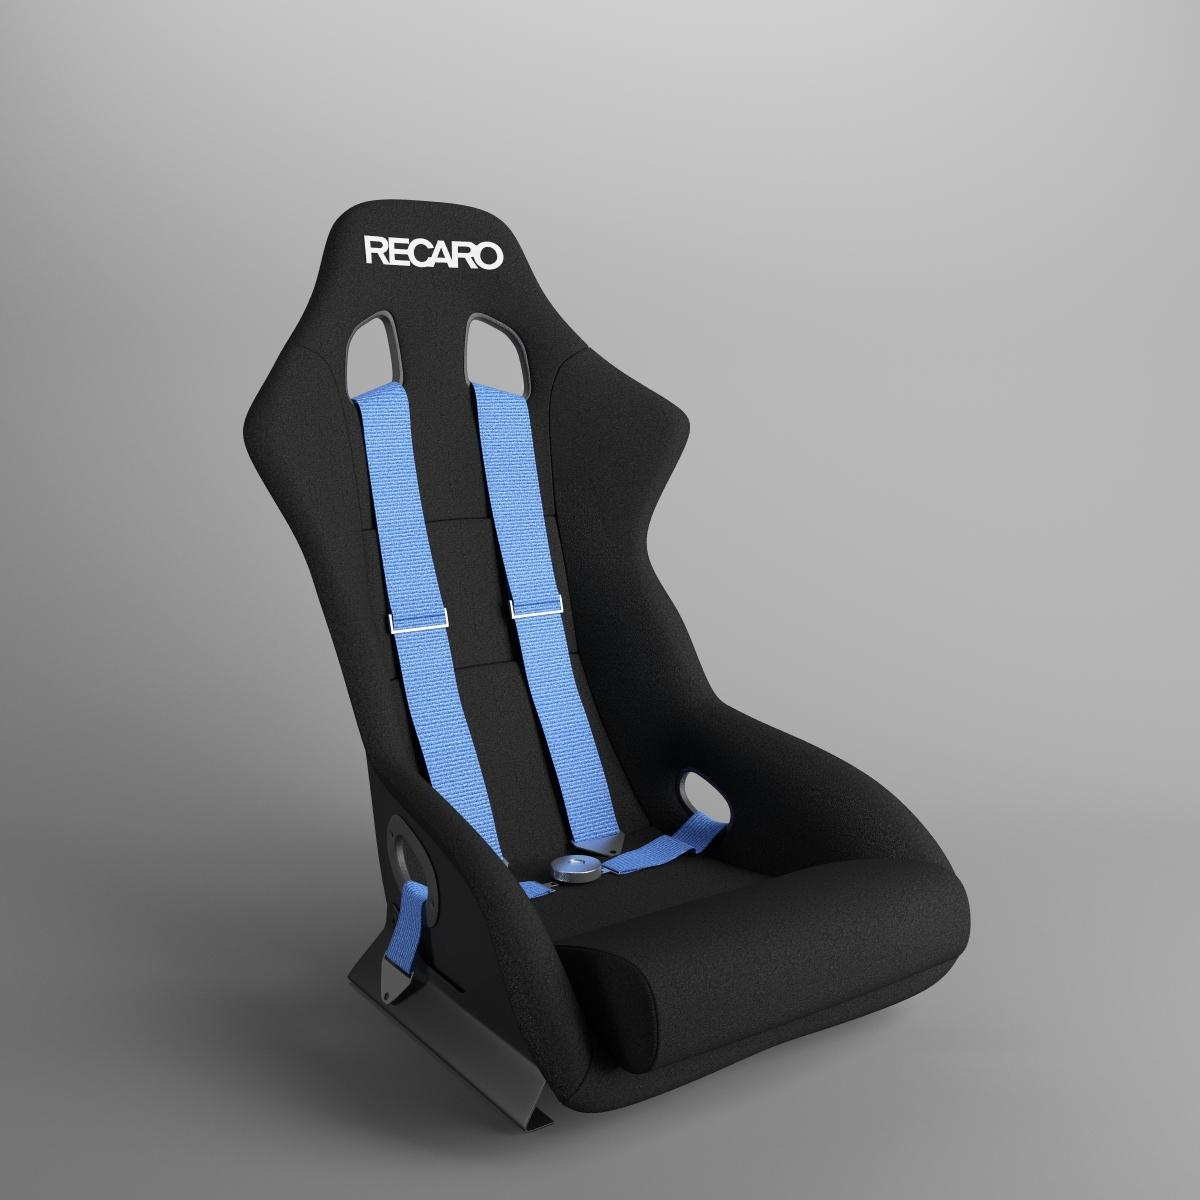 Recaro Racing Car Seat >> Recaro Racing Seat